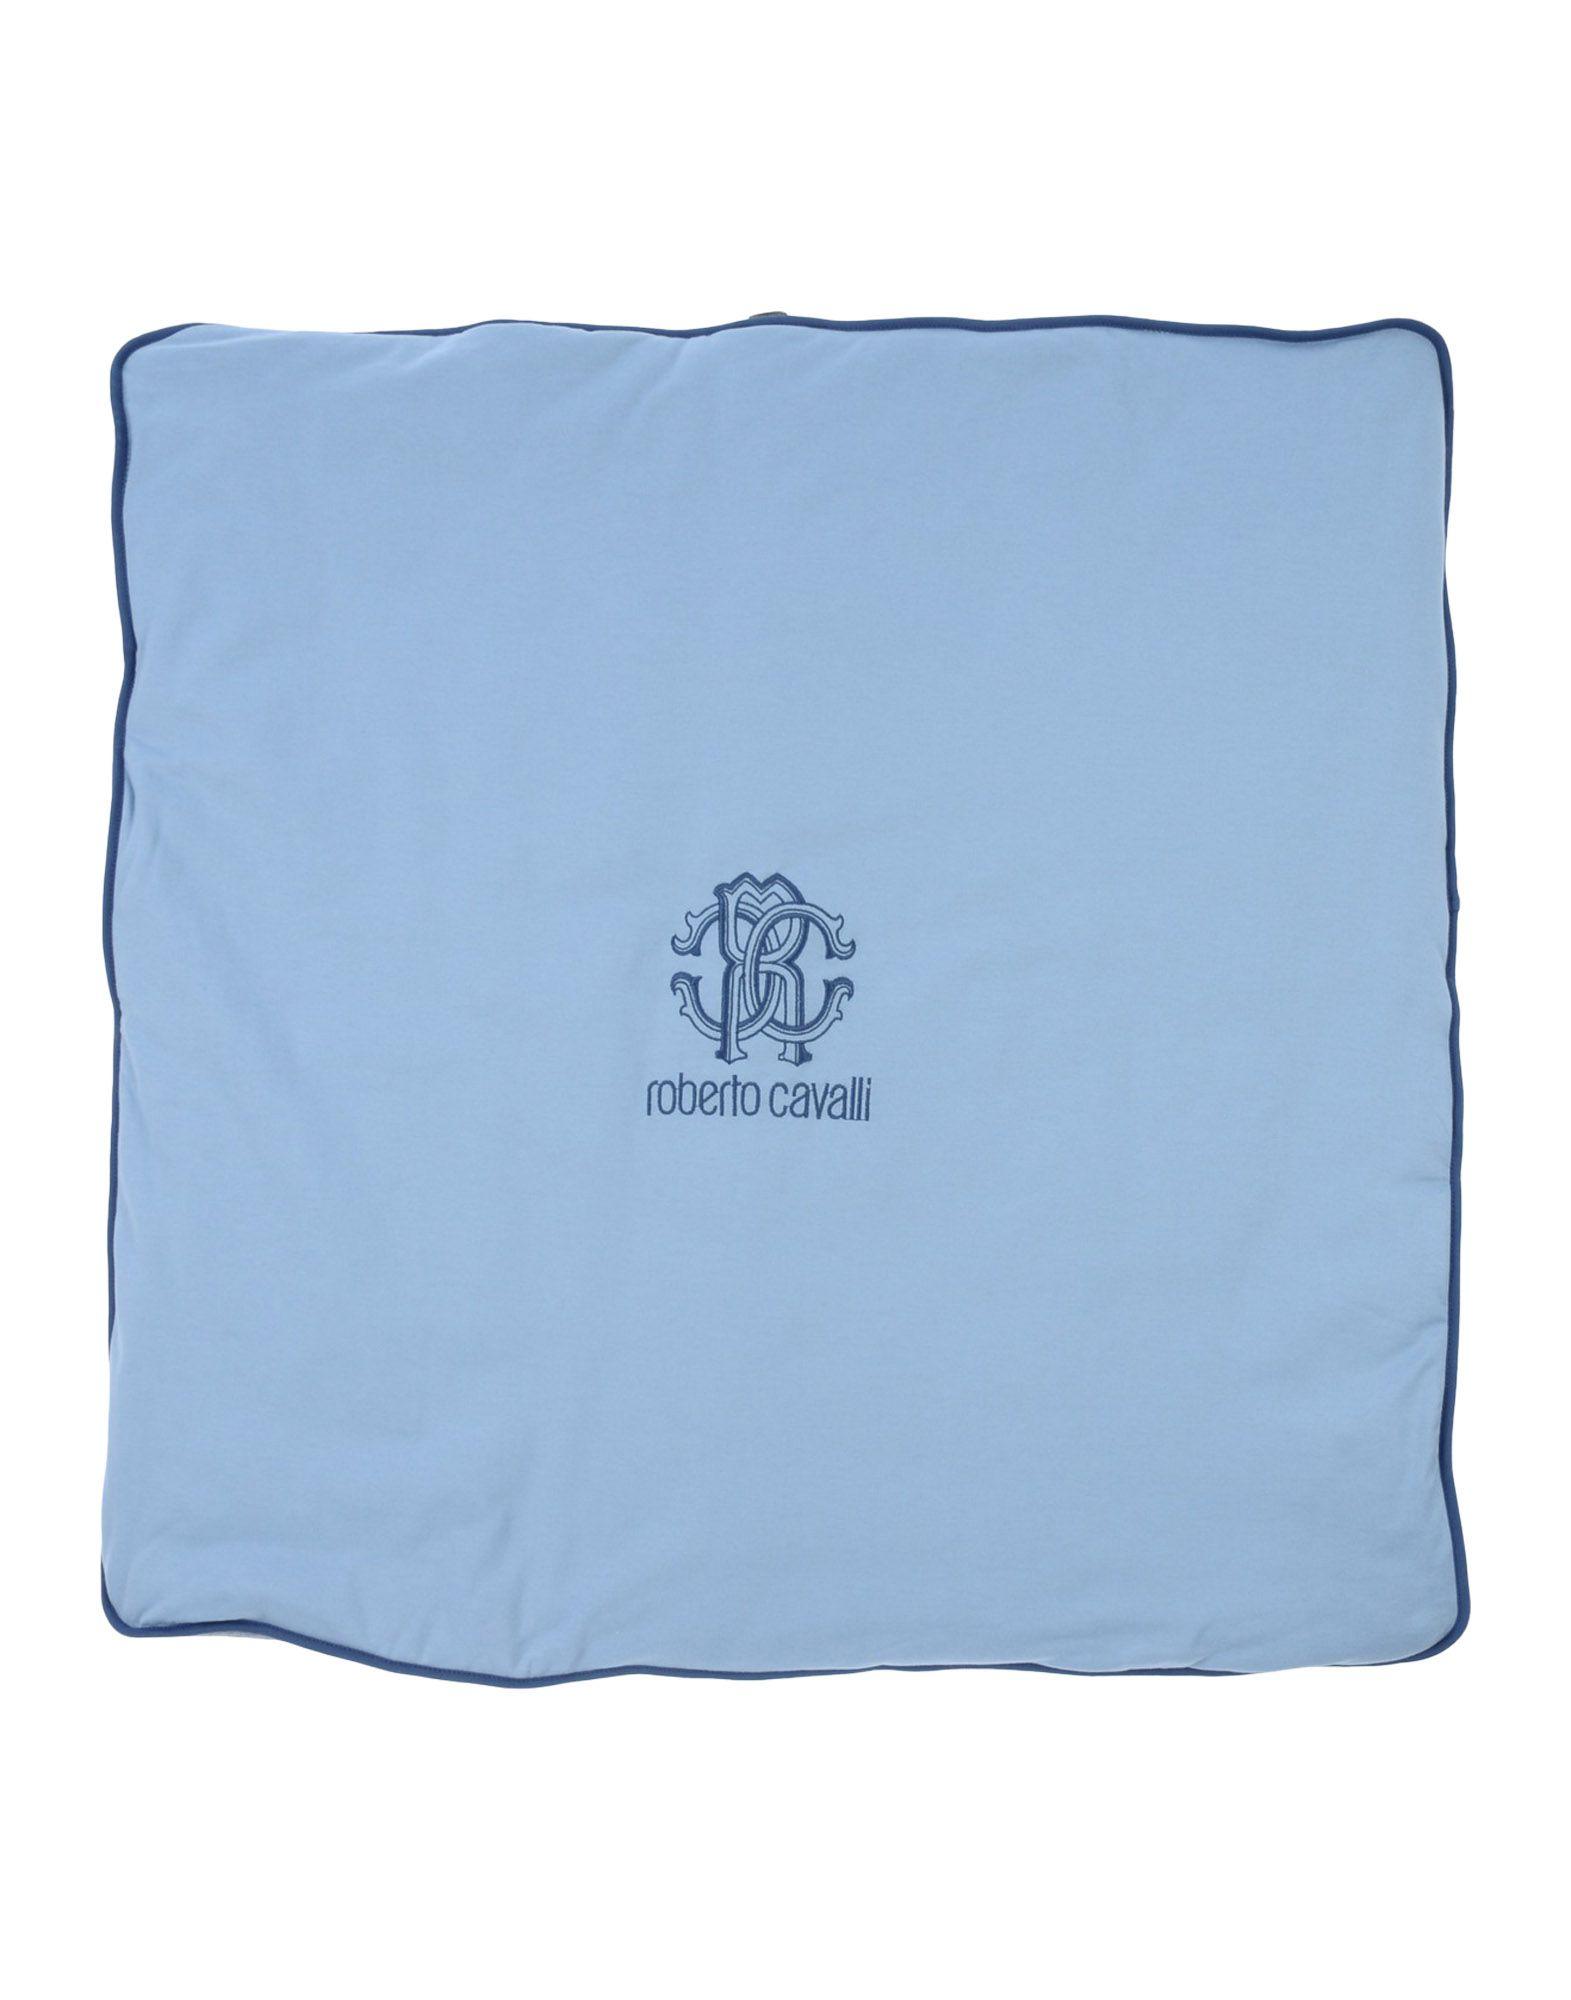 ROBERTO CAVALLI Одеяльце для младенцев molo одеяльце для младенцев